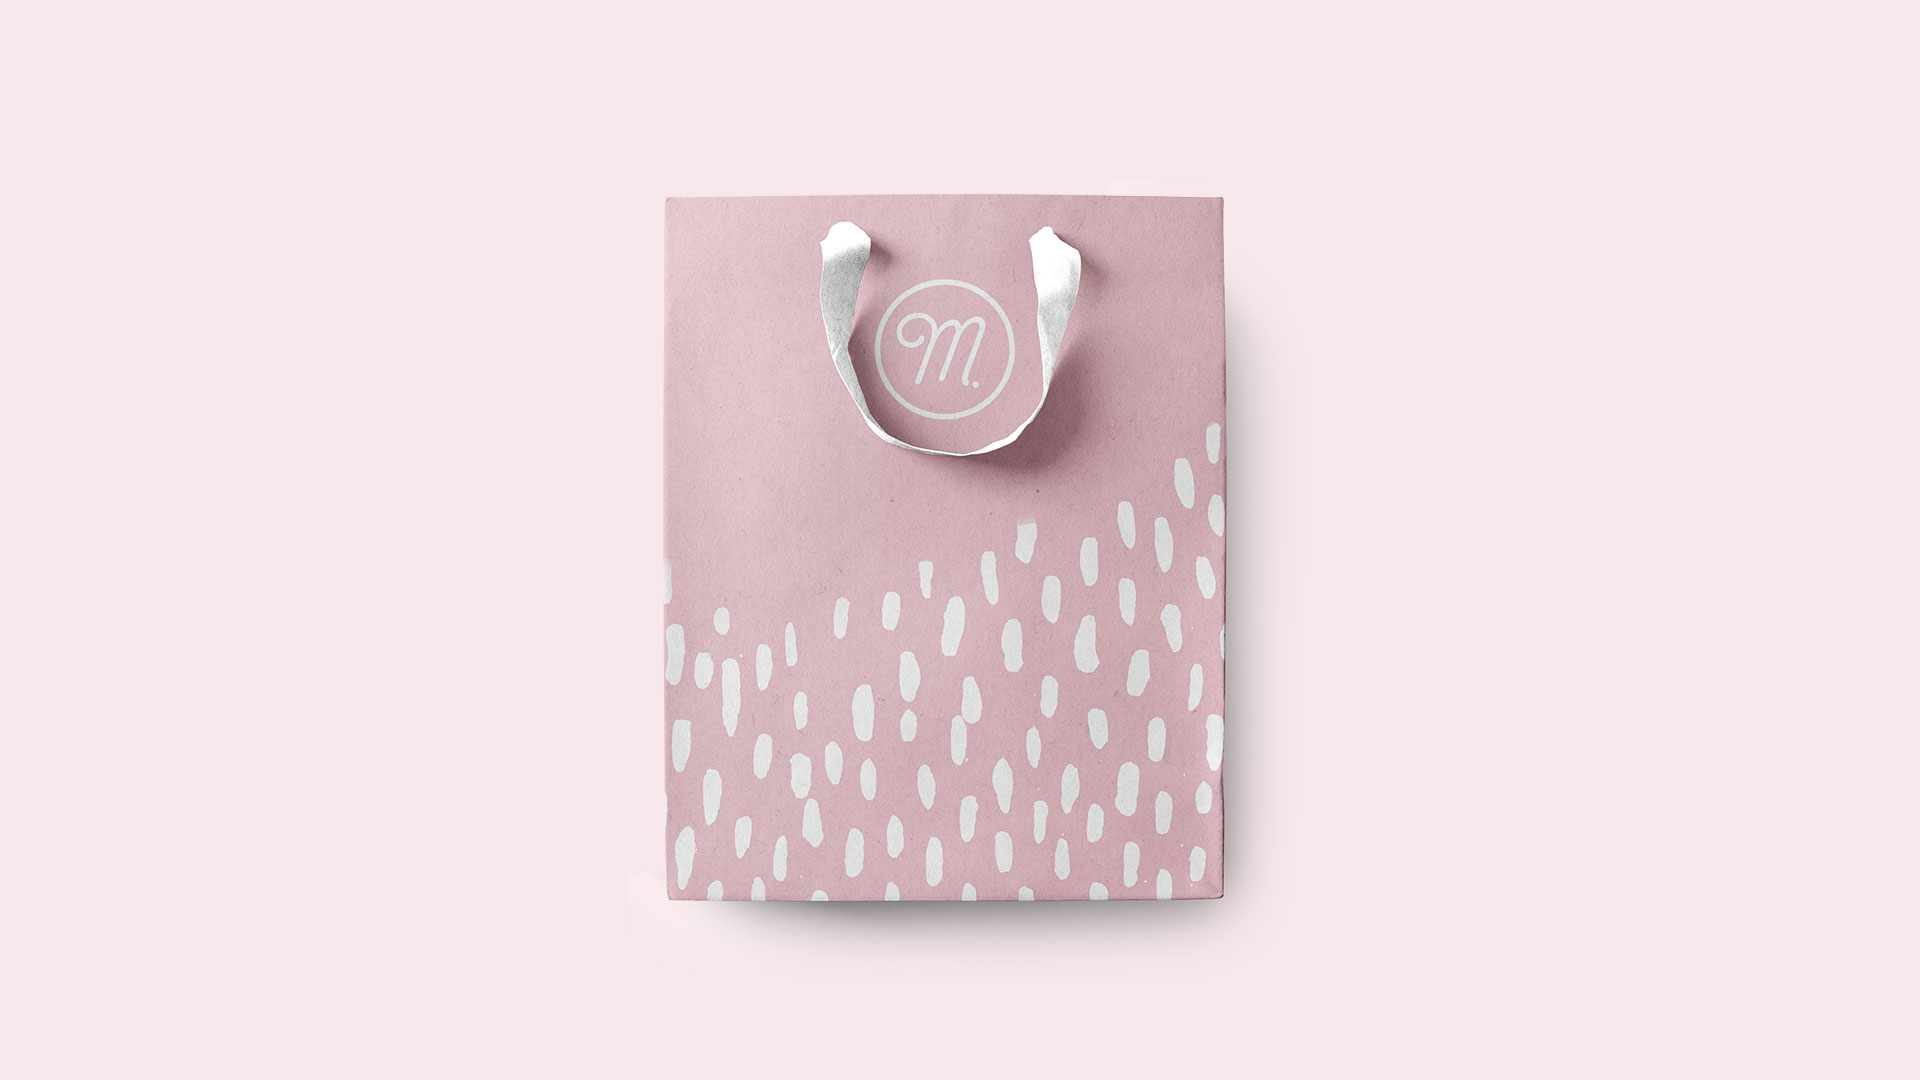 Maîtresse Branding Pastry Shop Macarons Bag